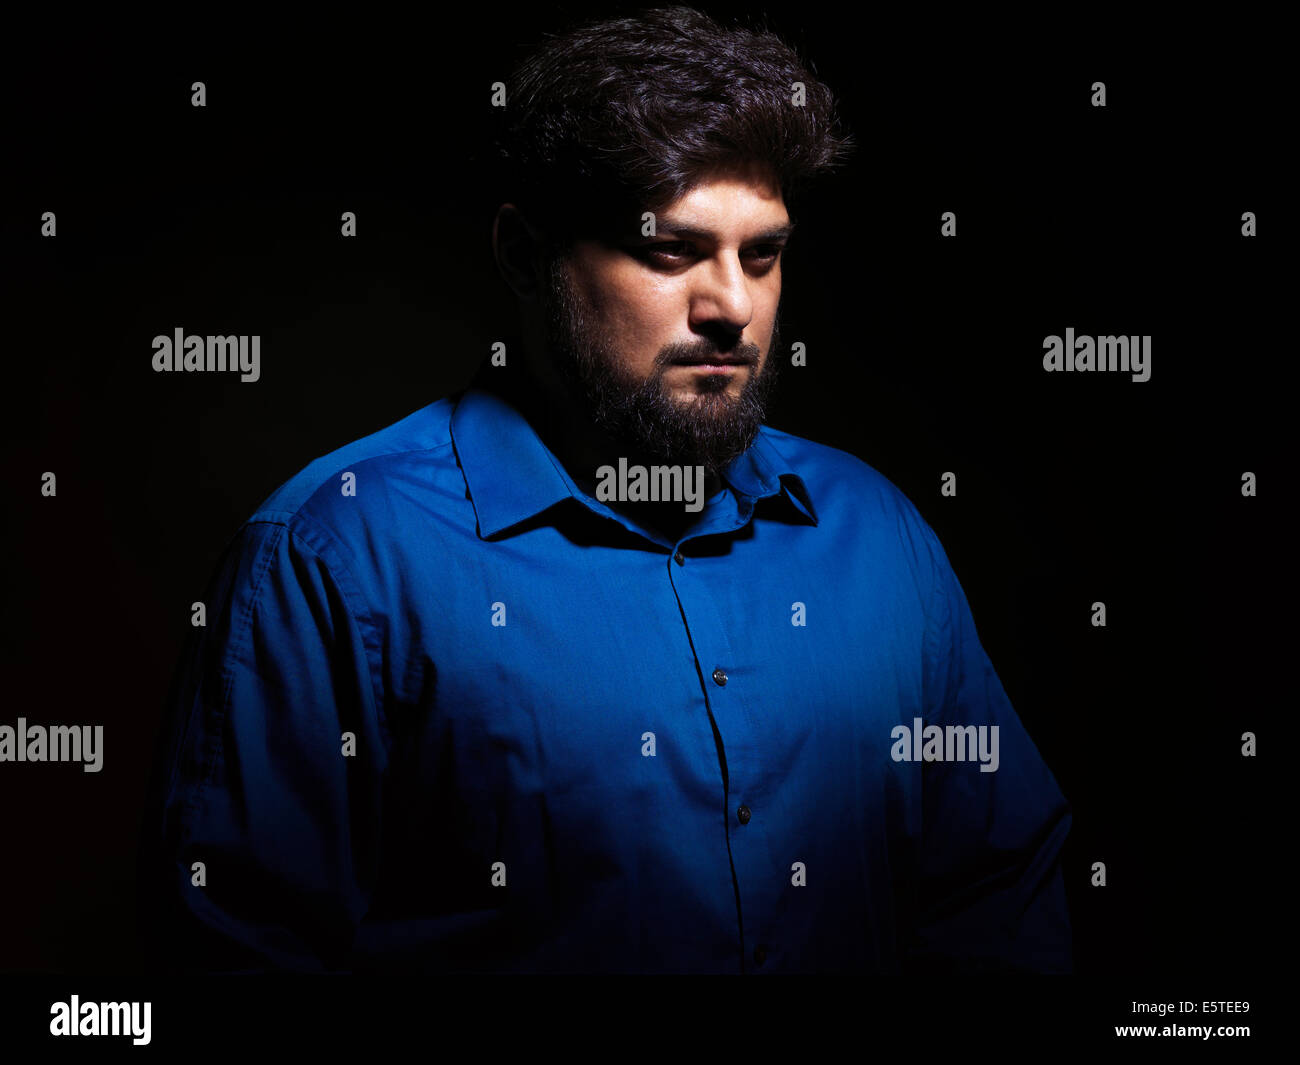 Portrait of a pakistani man isolated on black background - Stock Image